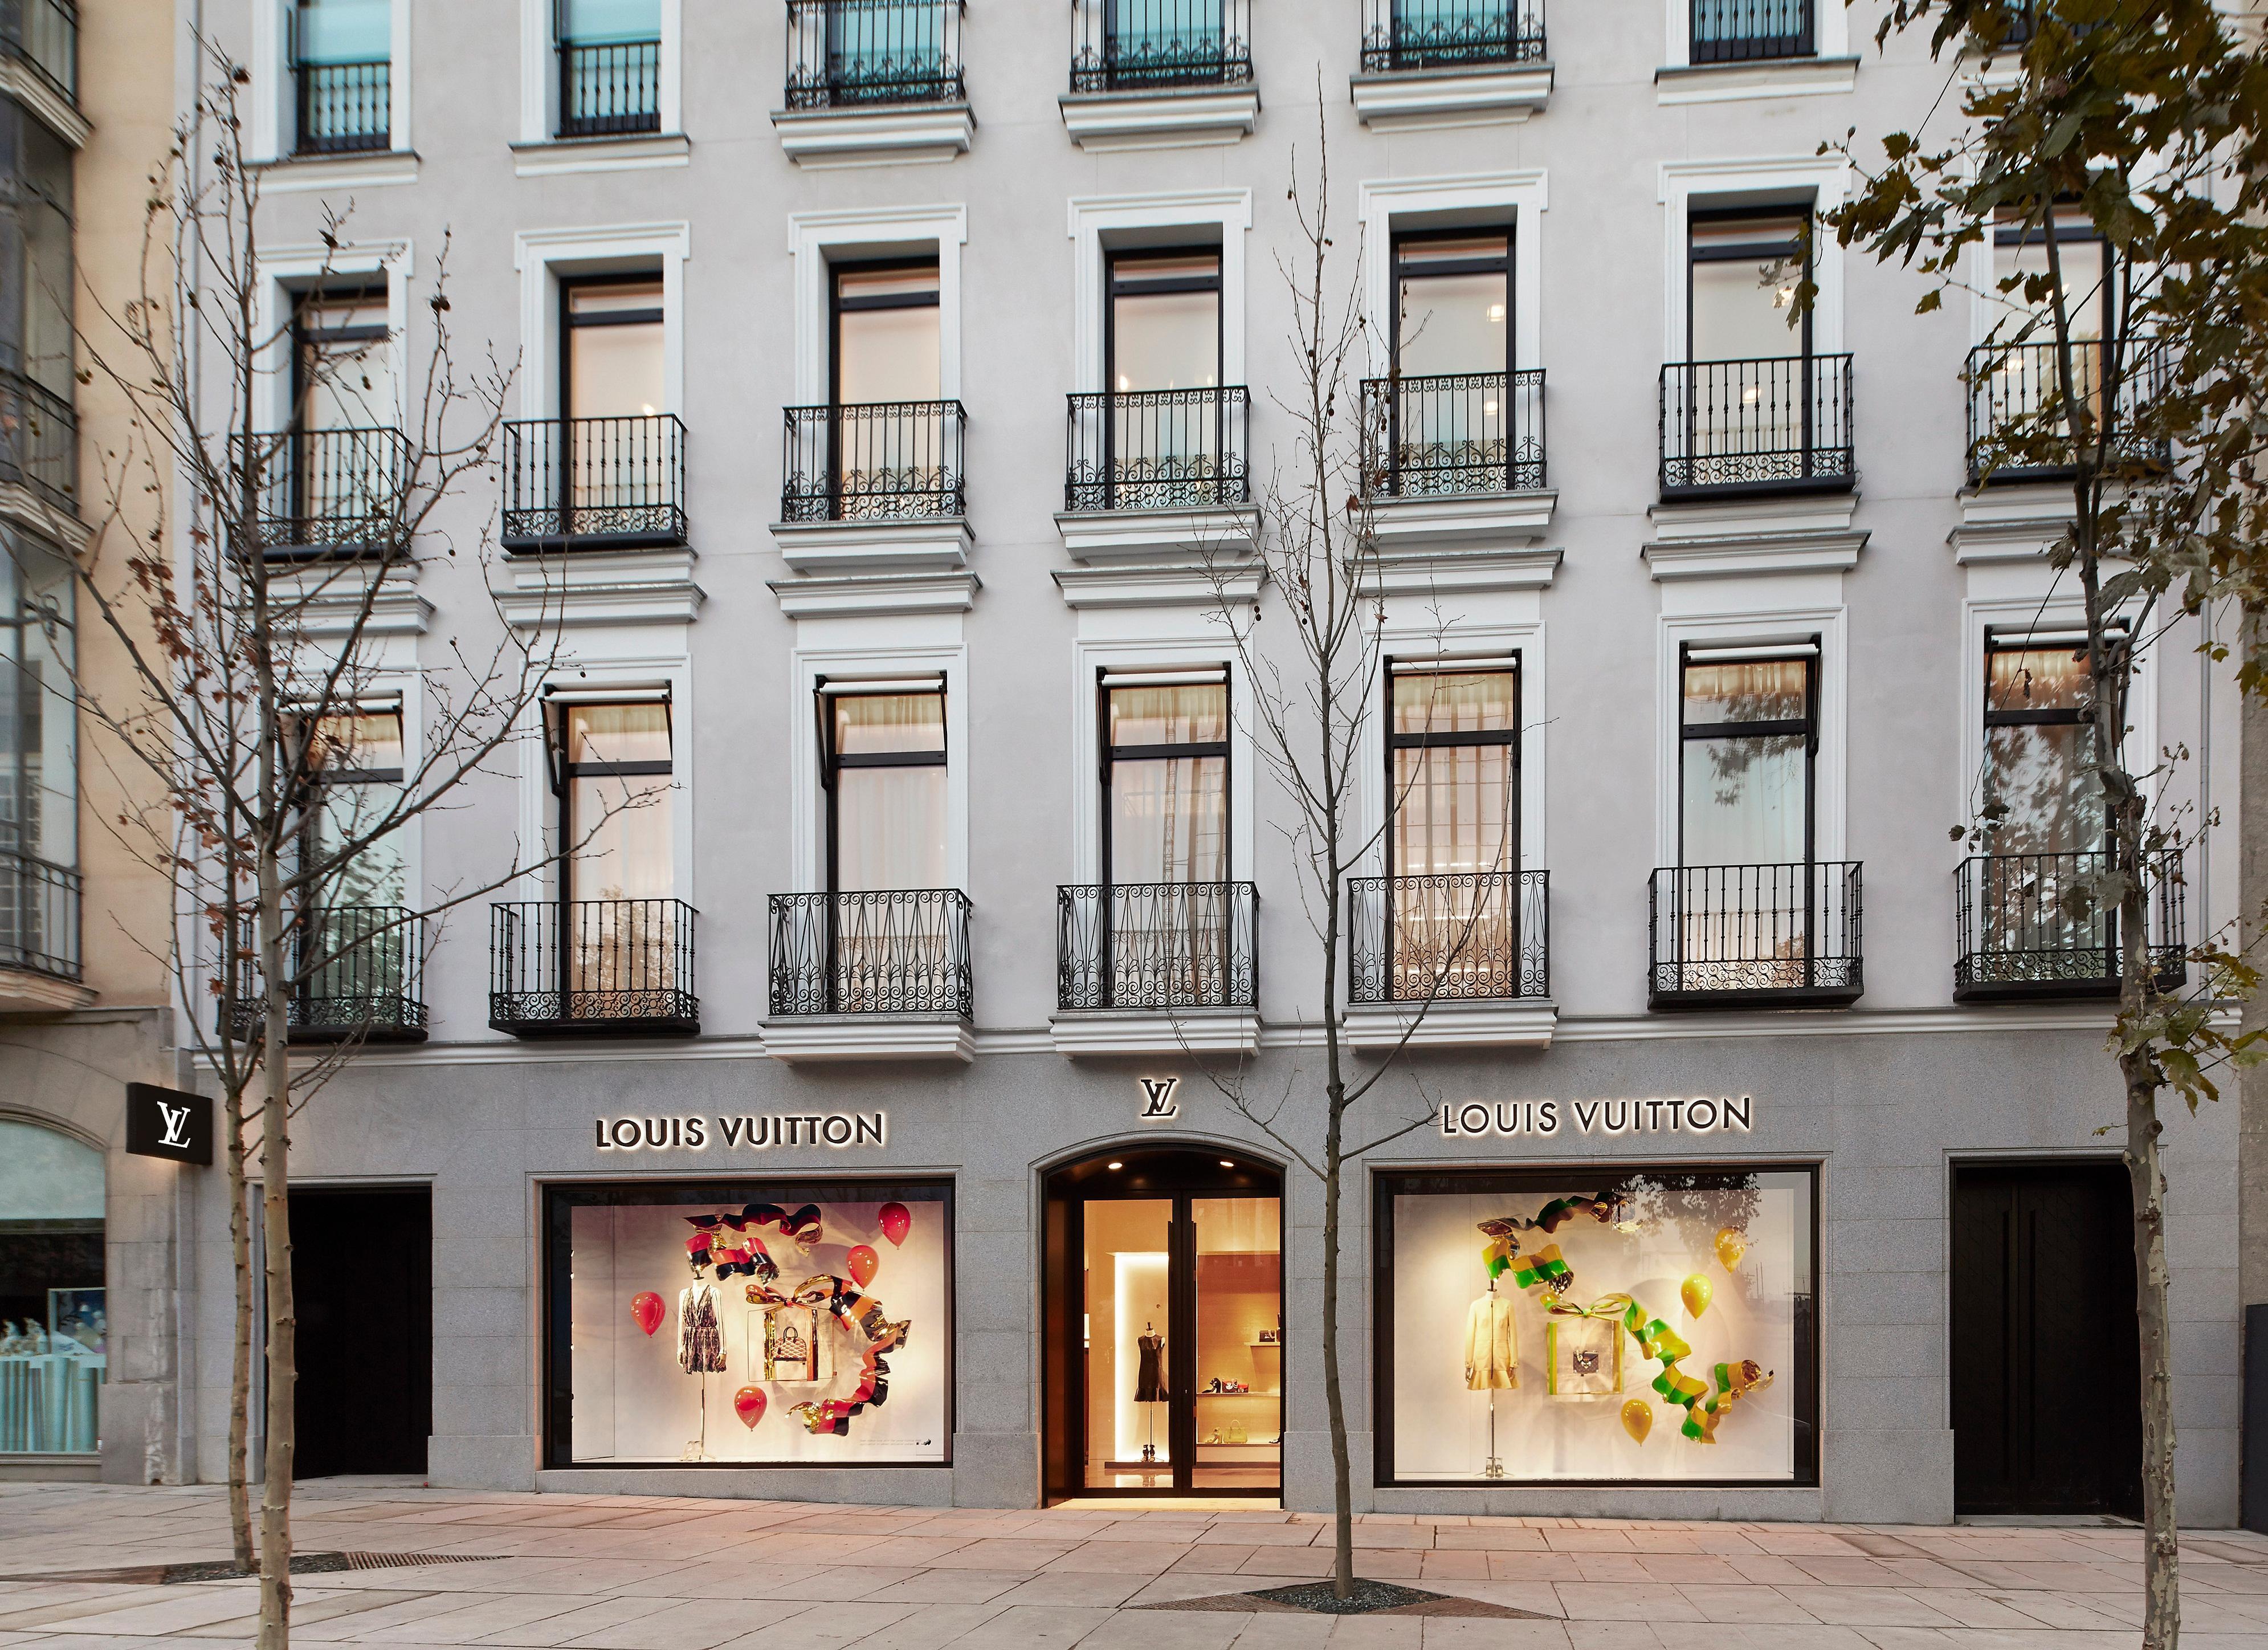 Louis Vuitton Madrid Serrano